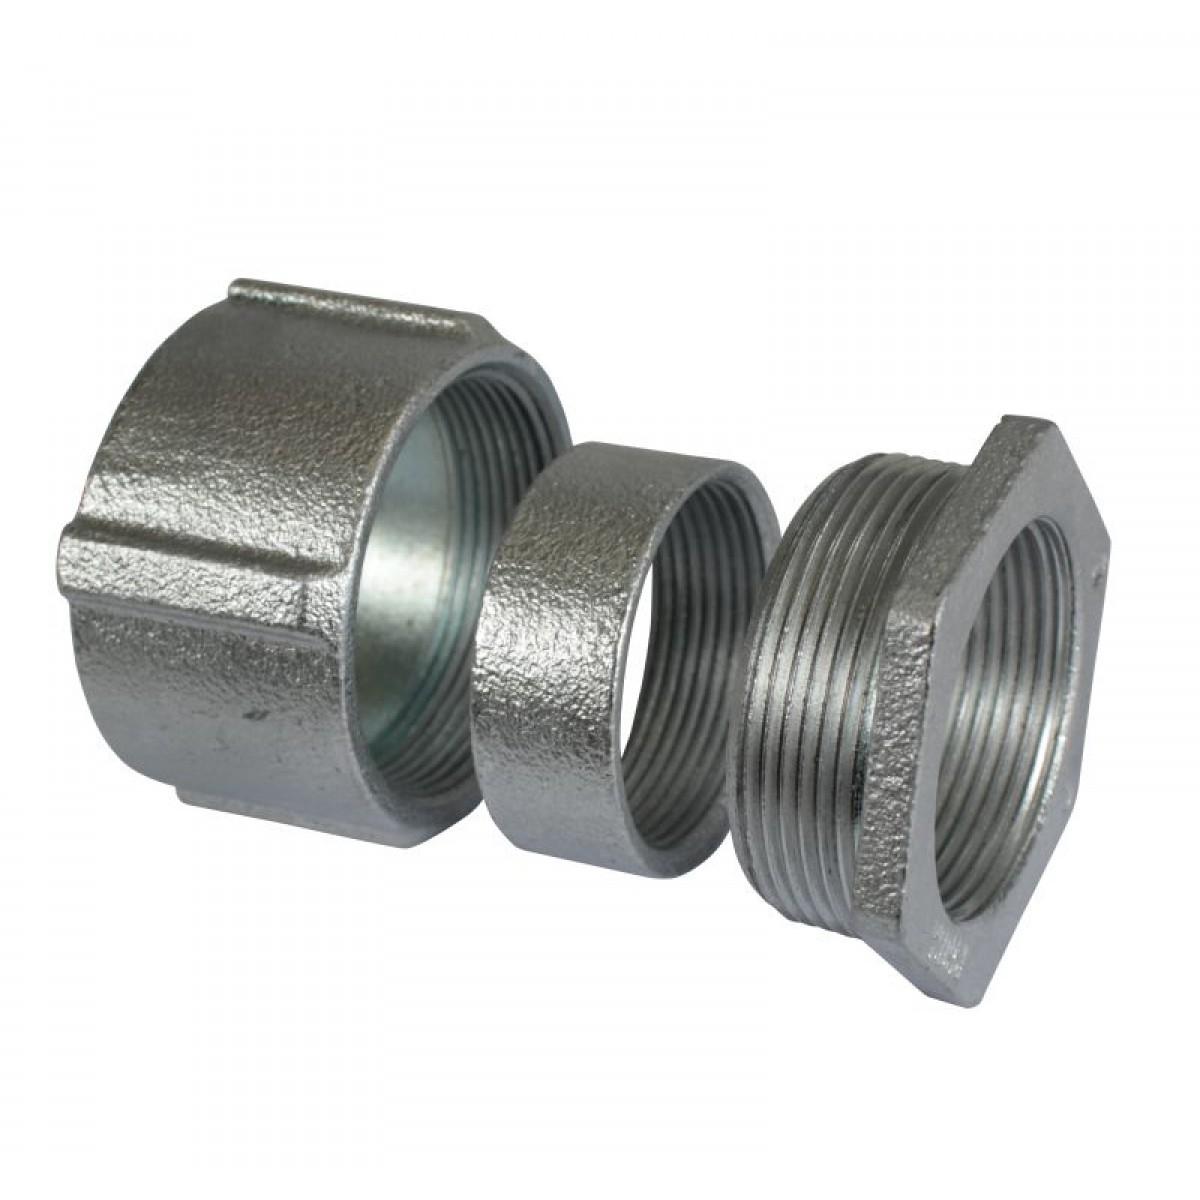 Malleable iron three piece rigid conduit couplings